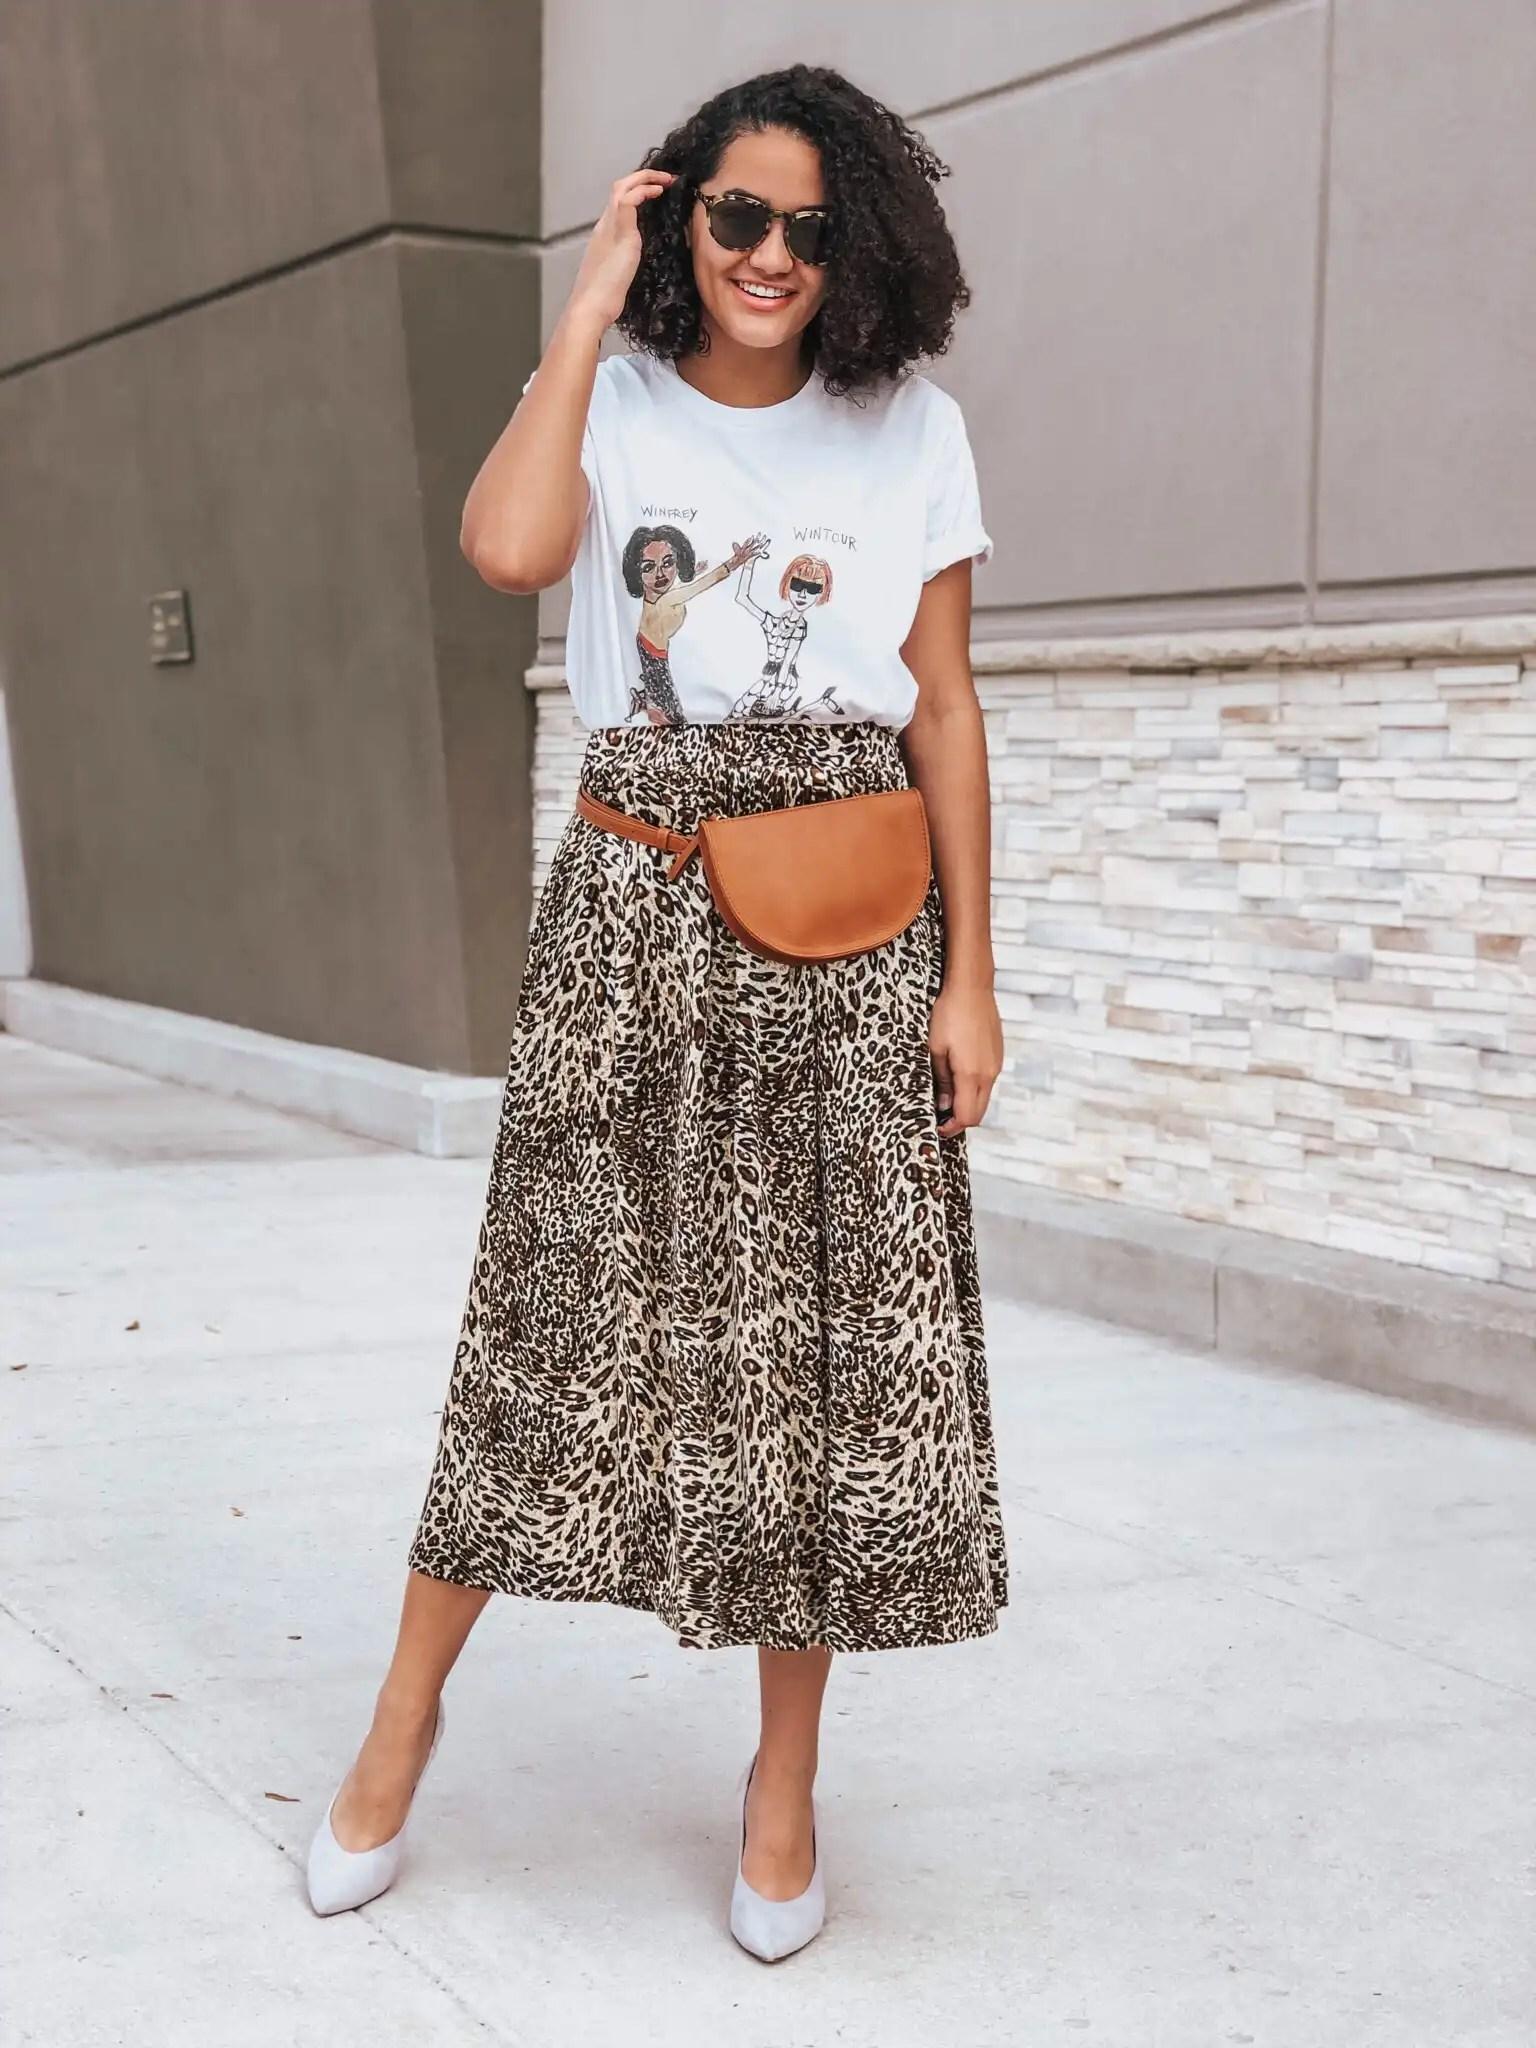 Graphic Tee Leopard Print Skirt Purple Heels